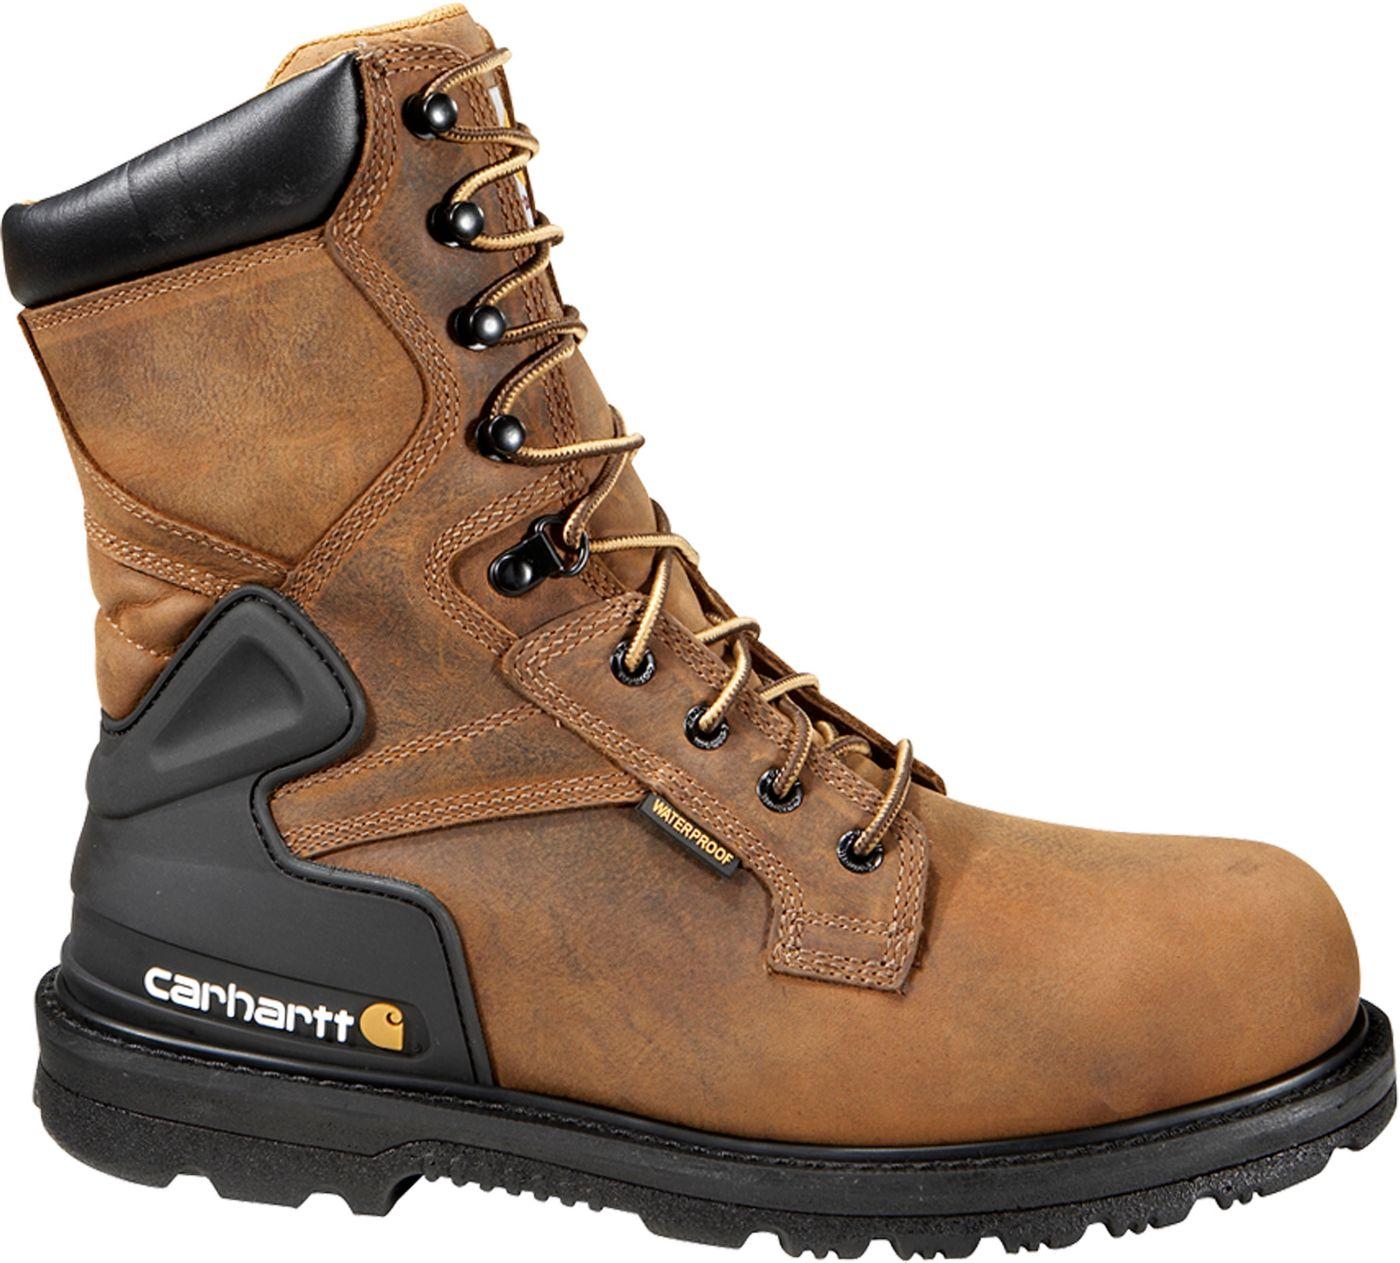 "Carhartt Men's Bison 8"" Safety Toe Waterproof Work Boots"